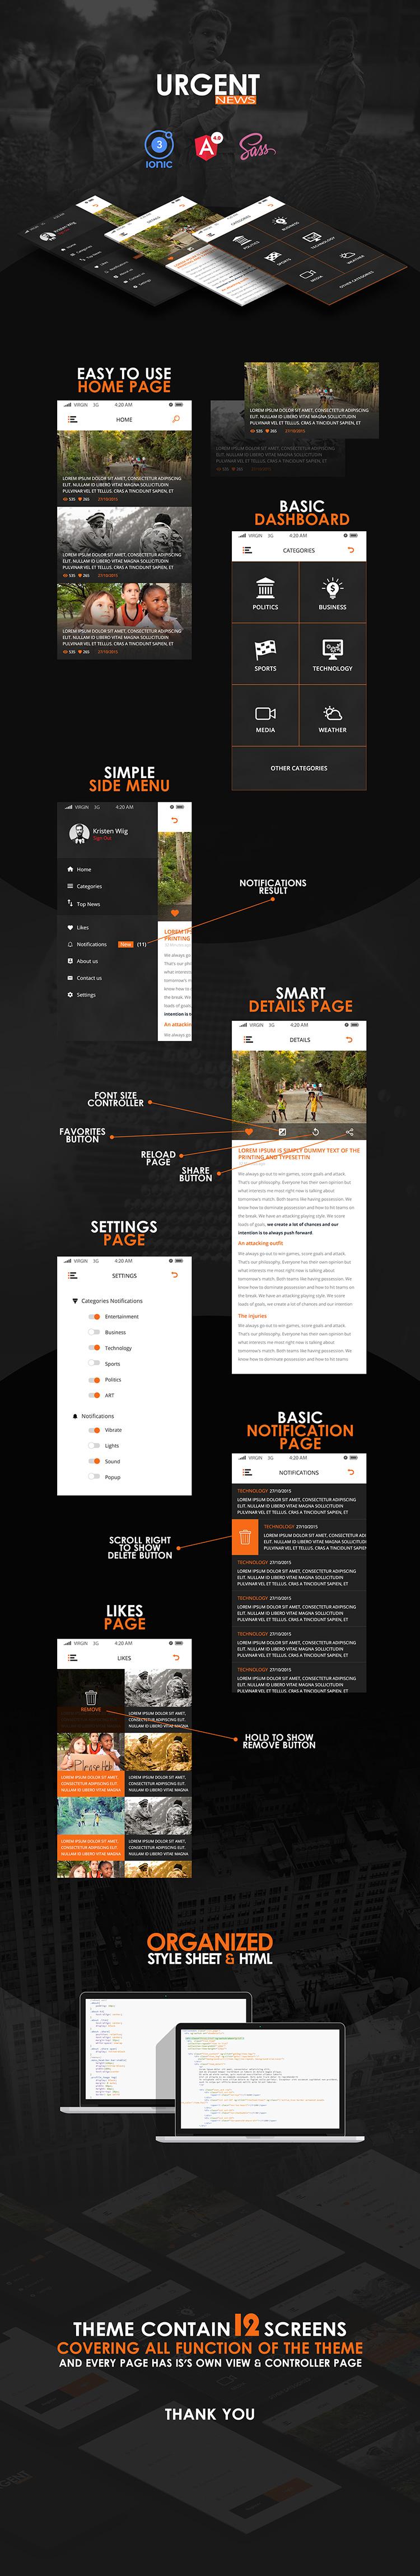 Urgent-ionic app theme